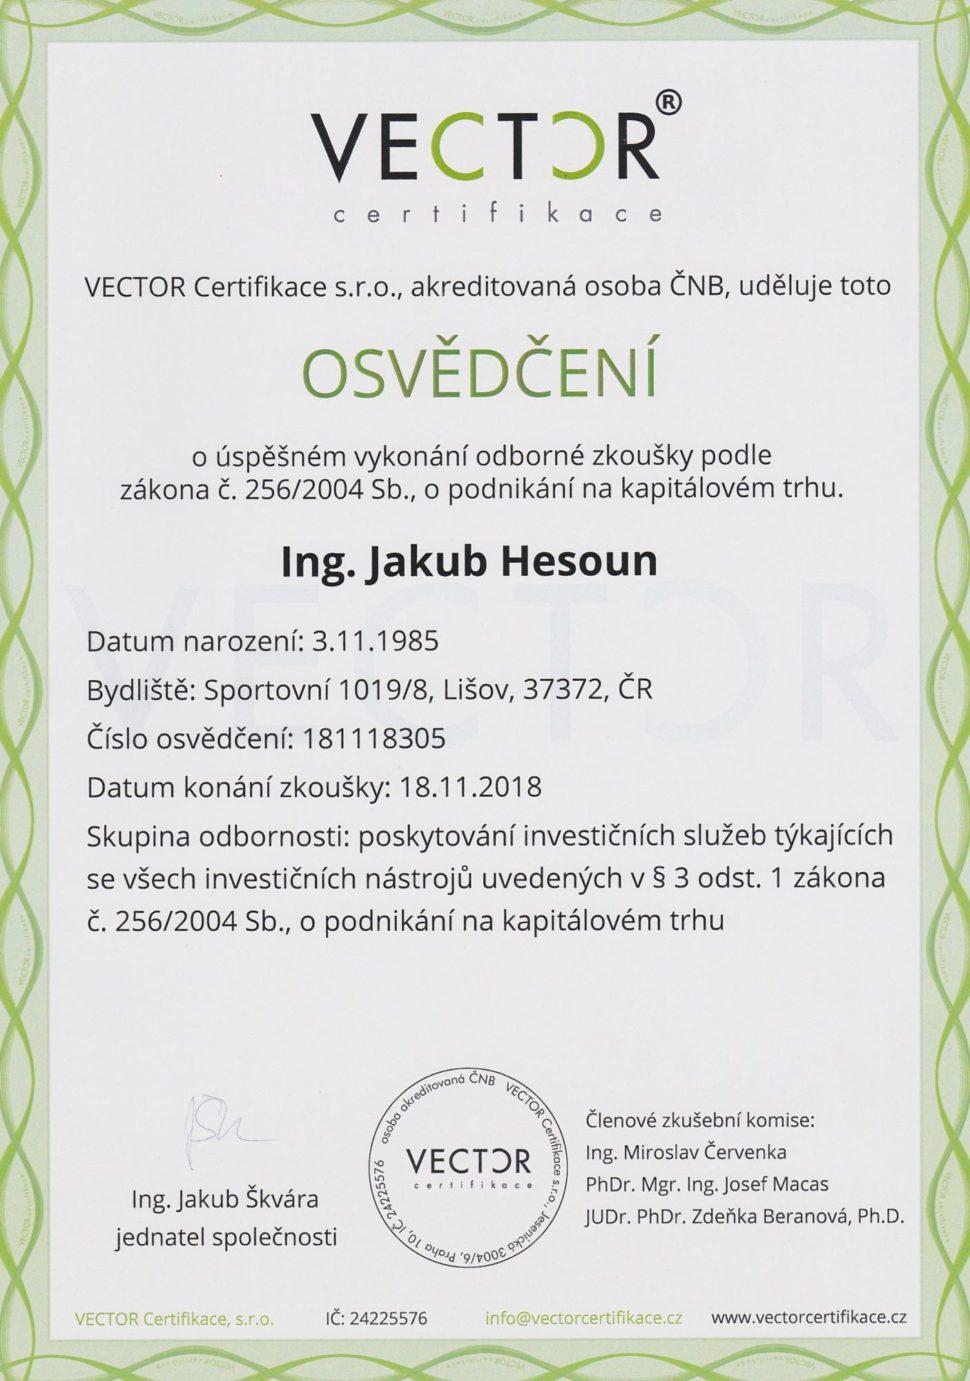 Udělila: VECTOR Certifikace